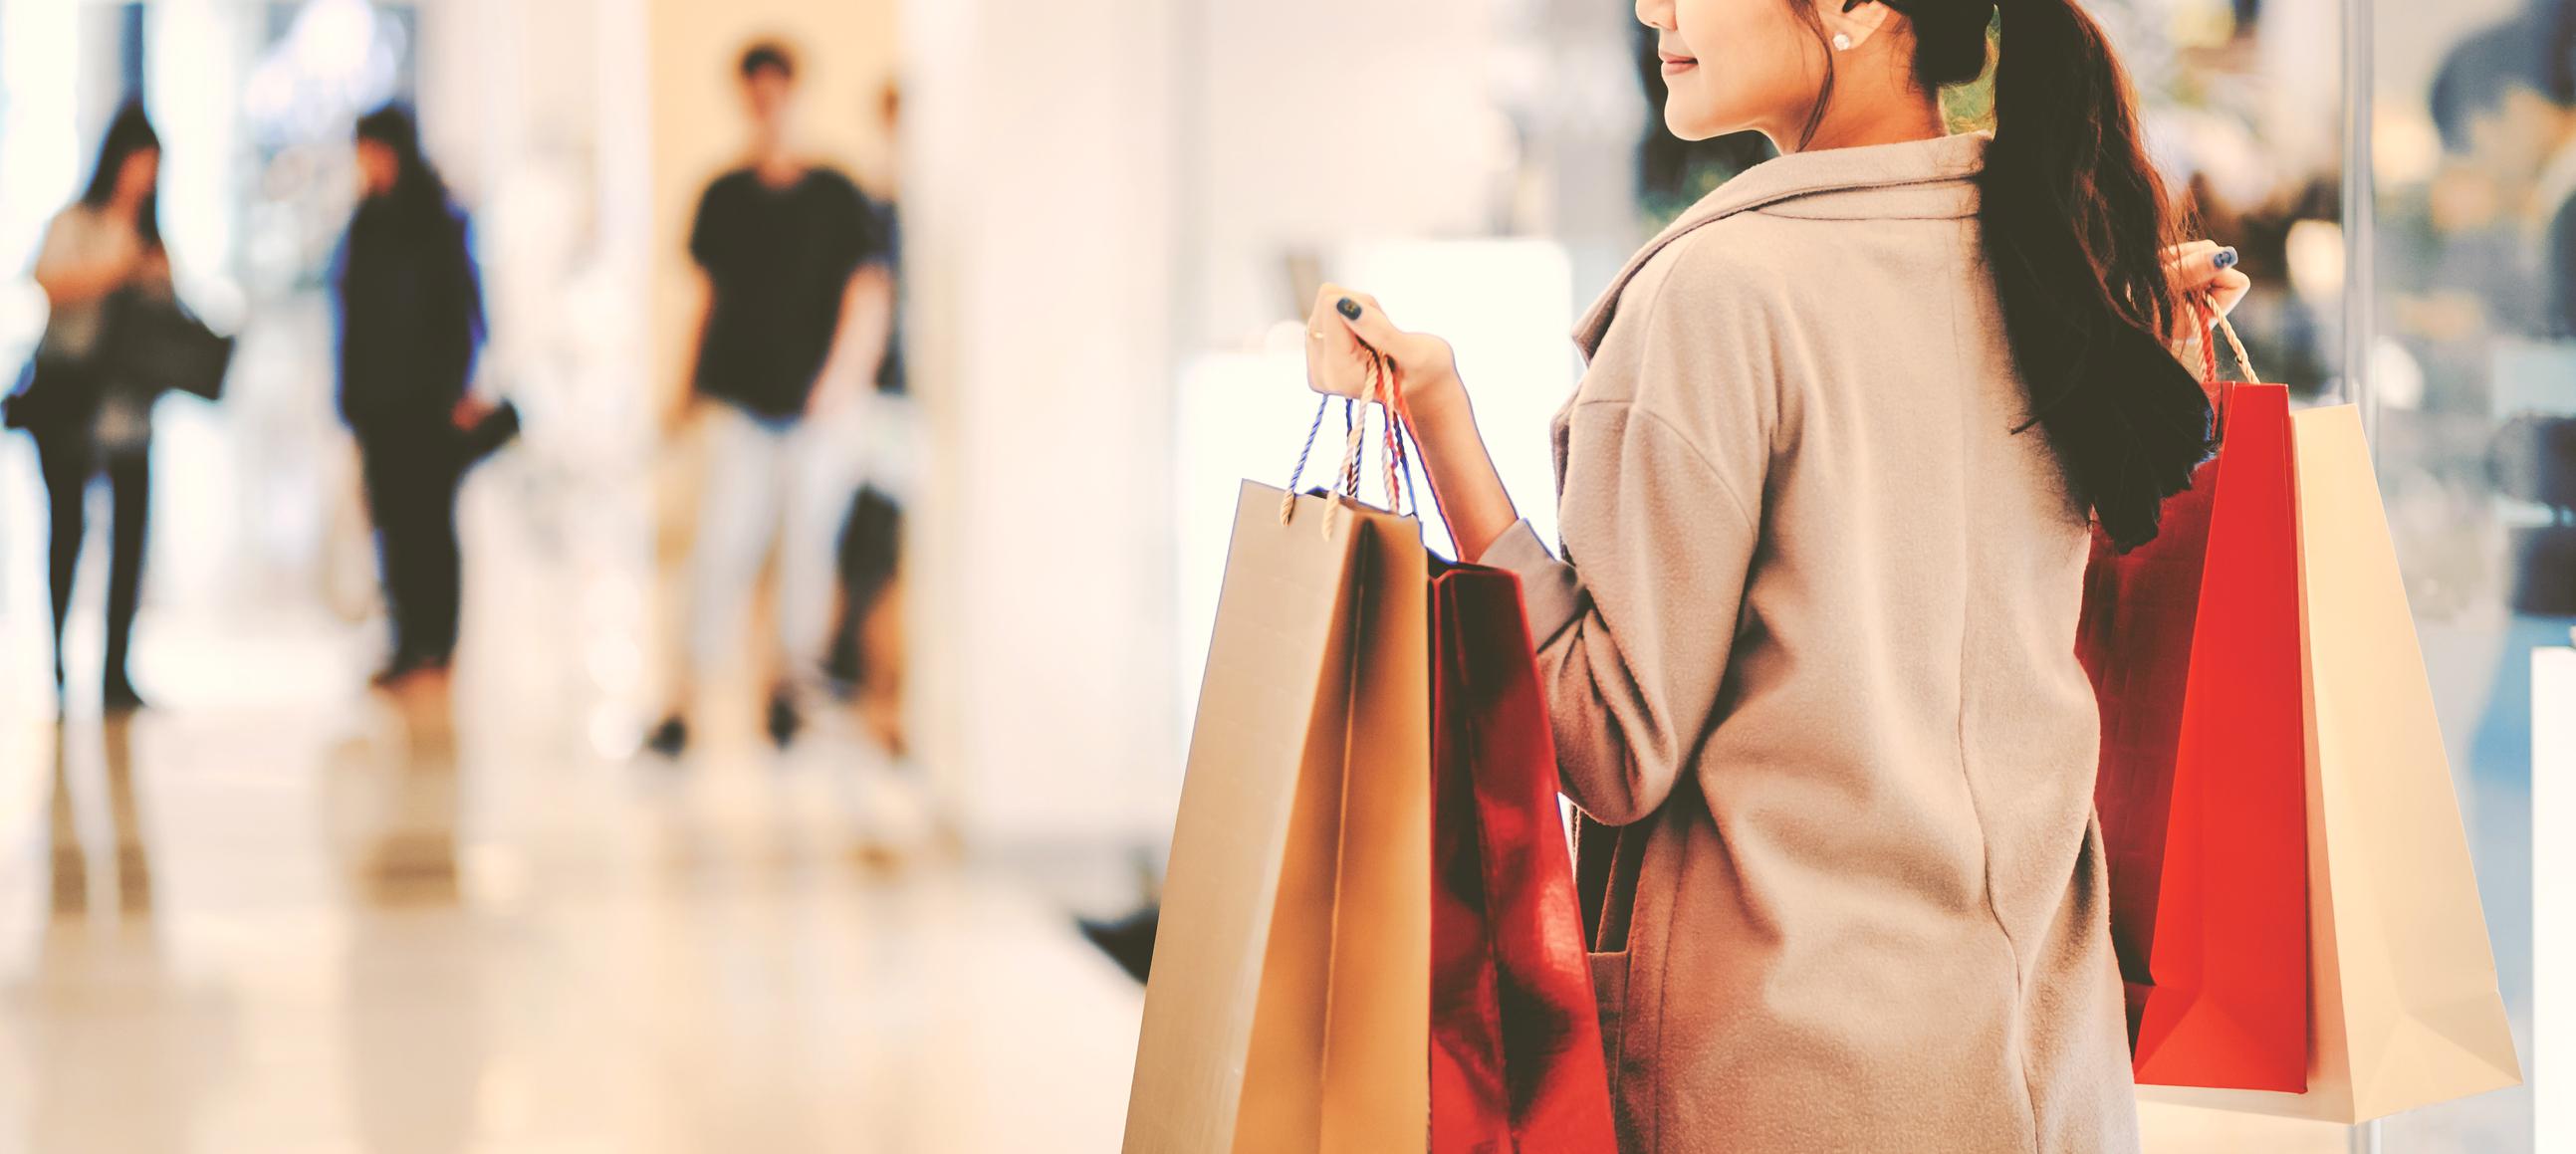 Buen Fin 2020: Consejos para comprar   Credimejora